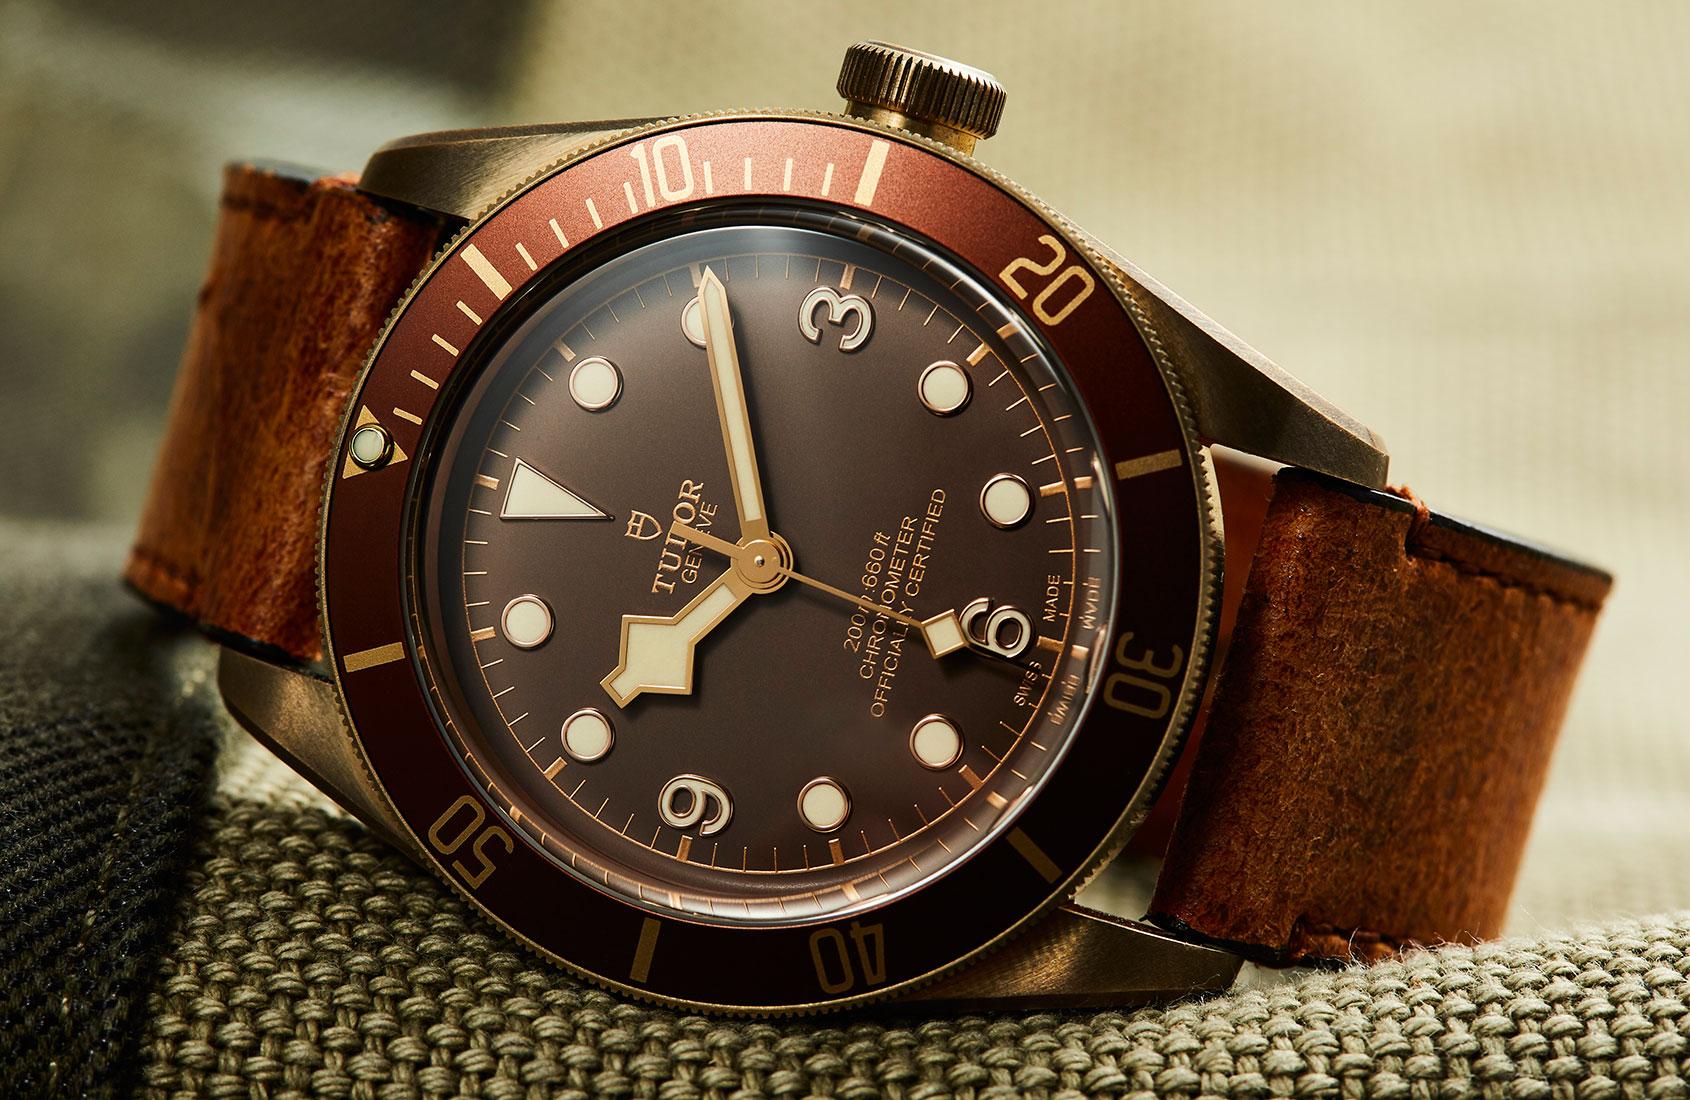 billige Rolex,Ladies watches,replicas Patek Philippe: IN-DEPTH ...